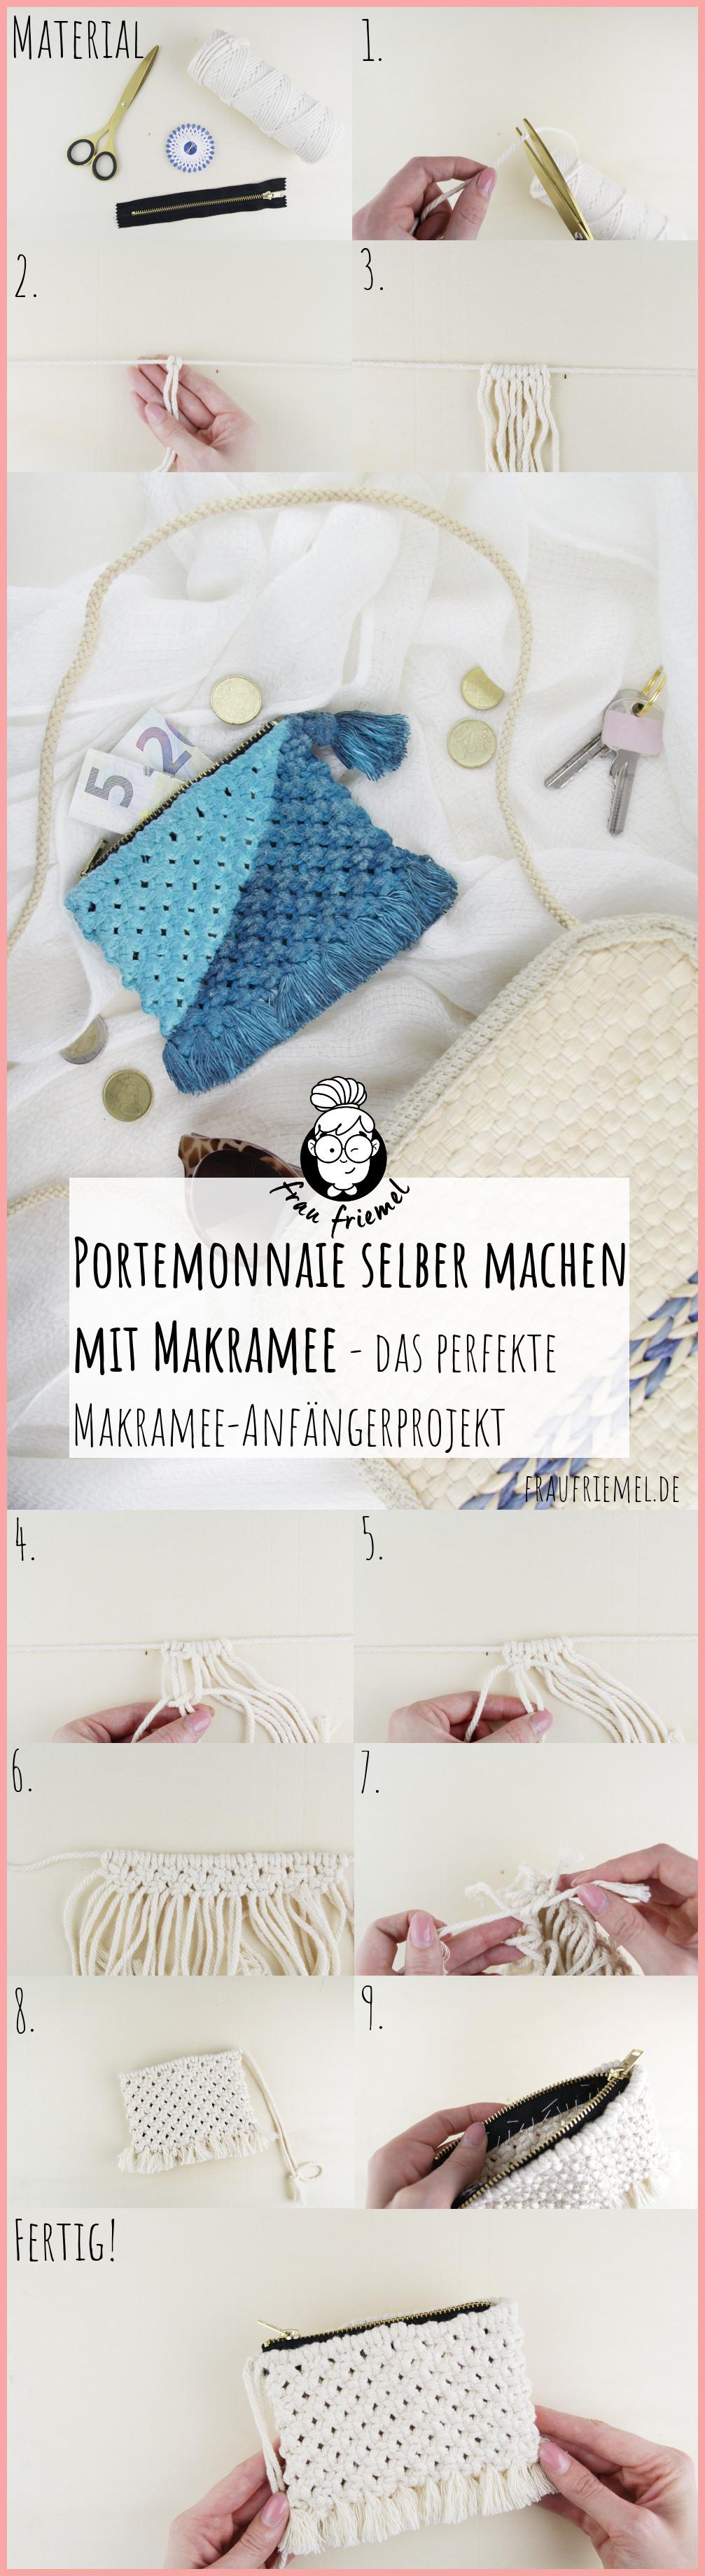 Makramee DIY Portemonnaie selber machen mit frau friemel - Gesamtanleitung